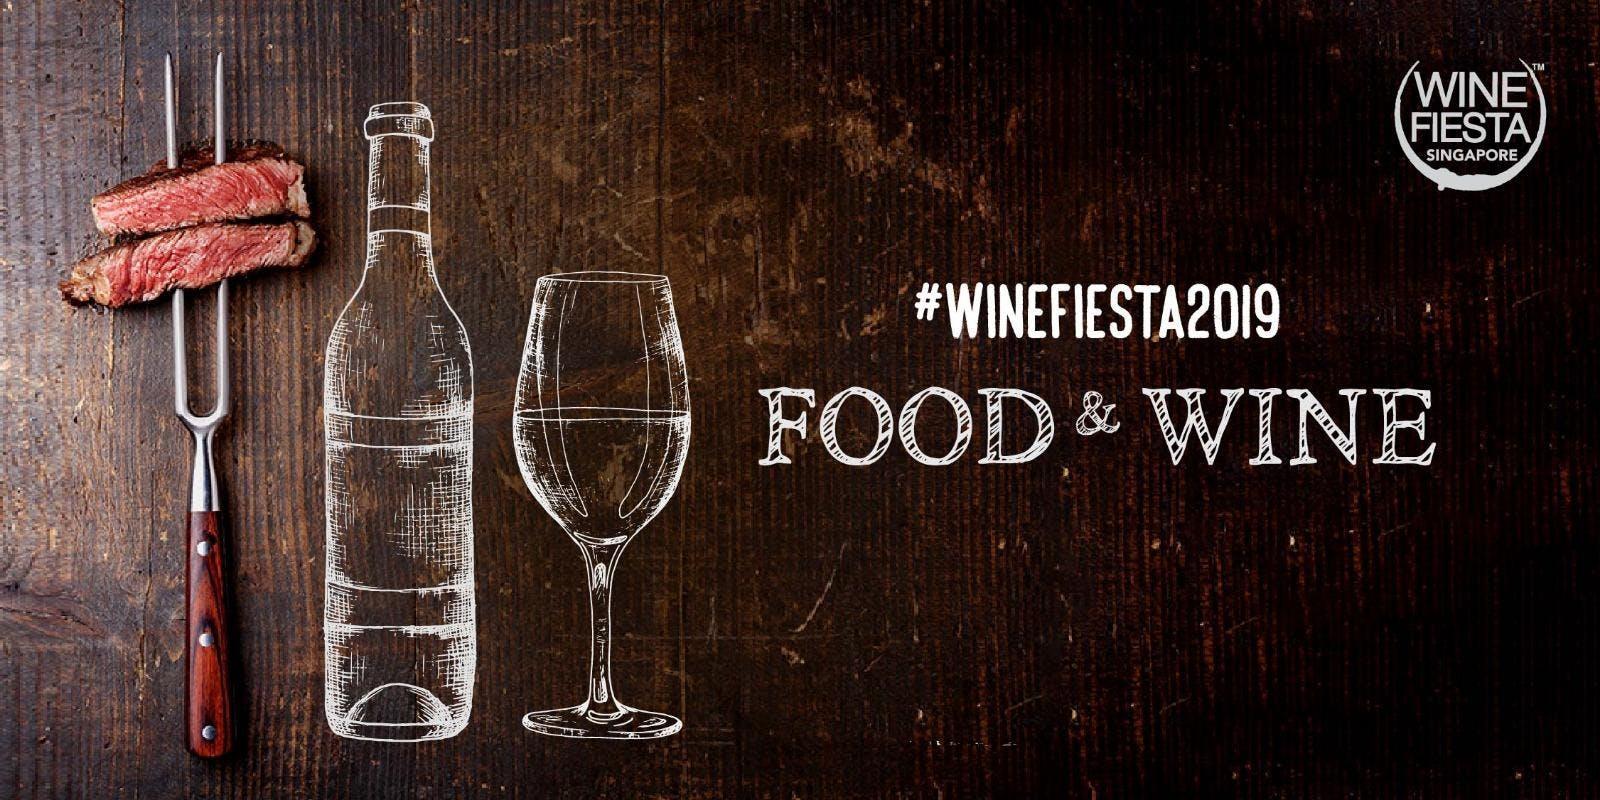 Wine Fiesta 2019 - Food festivals in Singapore